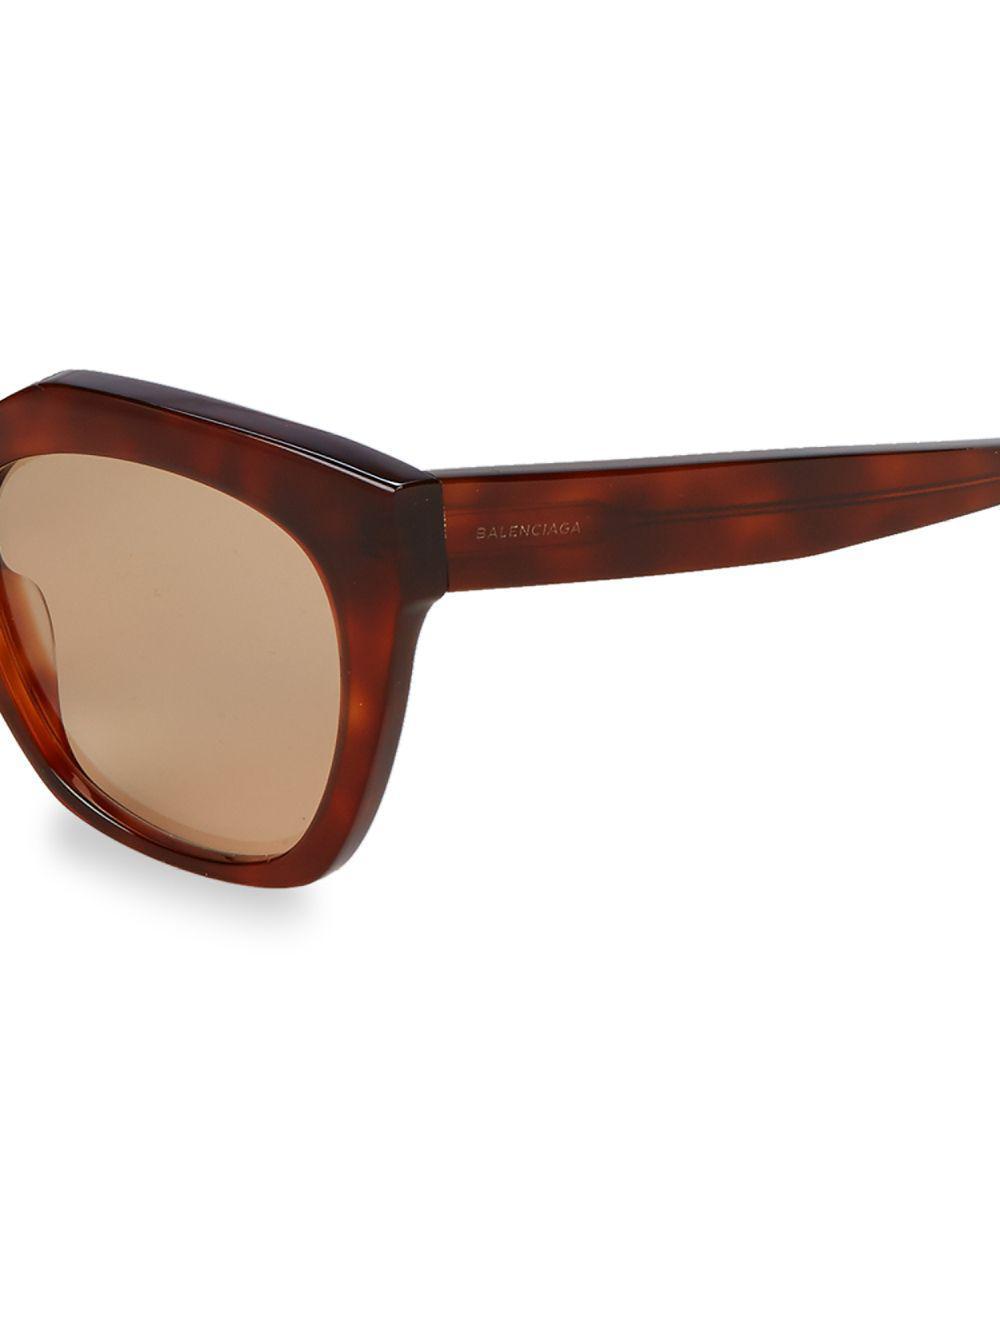 266c692eb4a Balenciaga - Brown 54mm Square Sunglasses - Lyst. View fullscreen